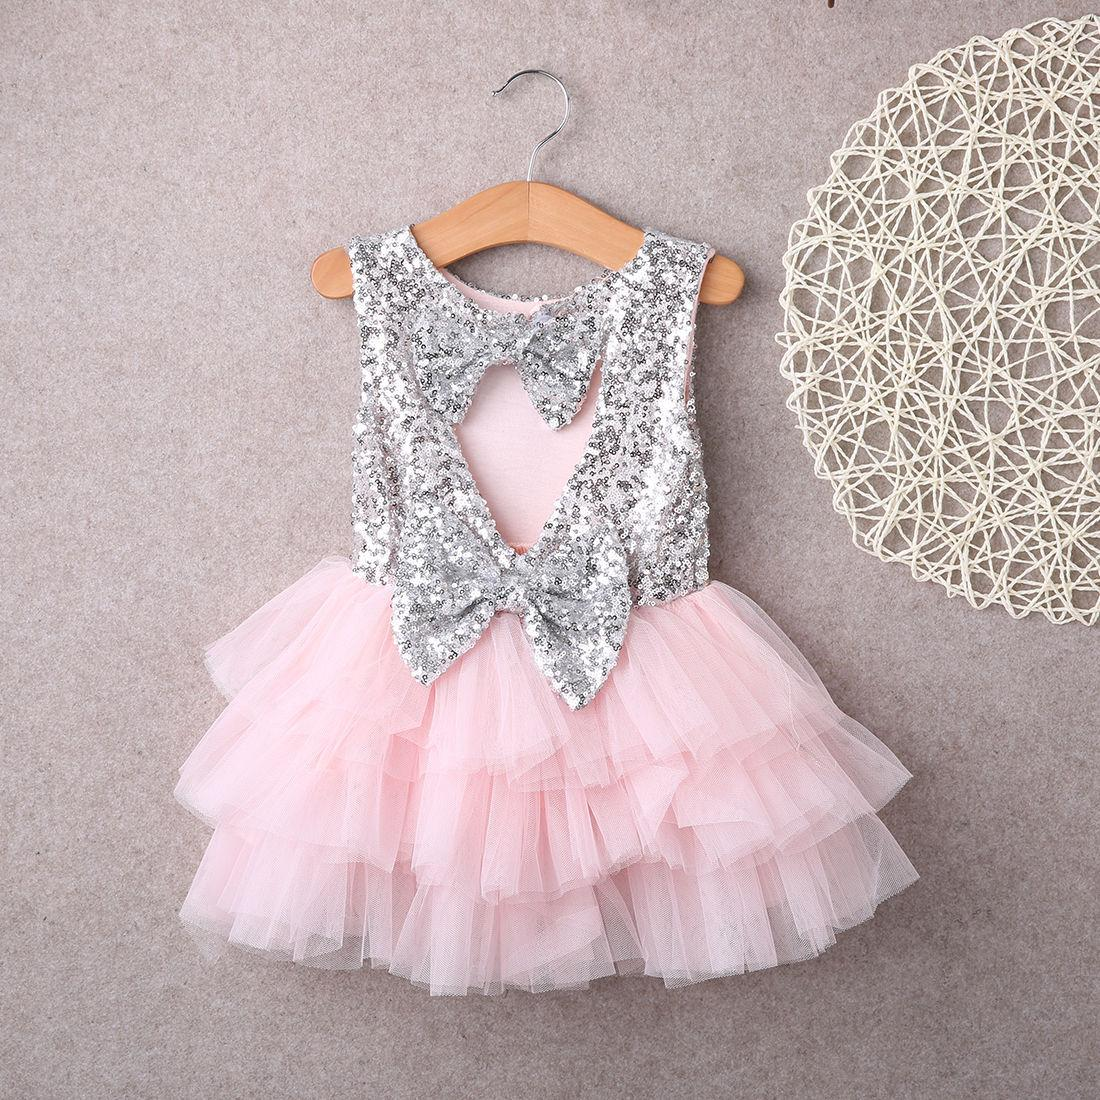 Bowknot Cake Dress Party Mini Ball Gown Dress Moda Baby Bambini Ragazze Abiti vestiti Paillettes Backless Bow Gold Lace Dress